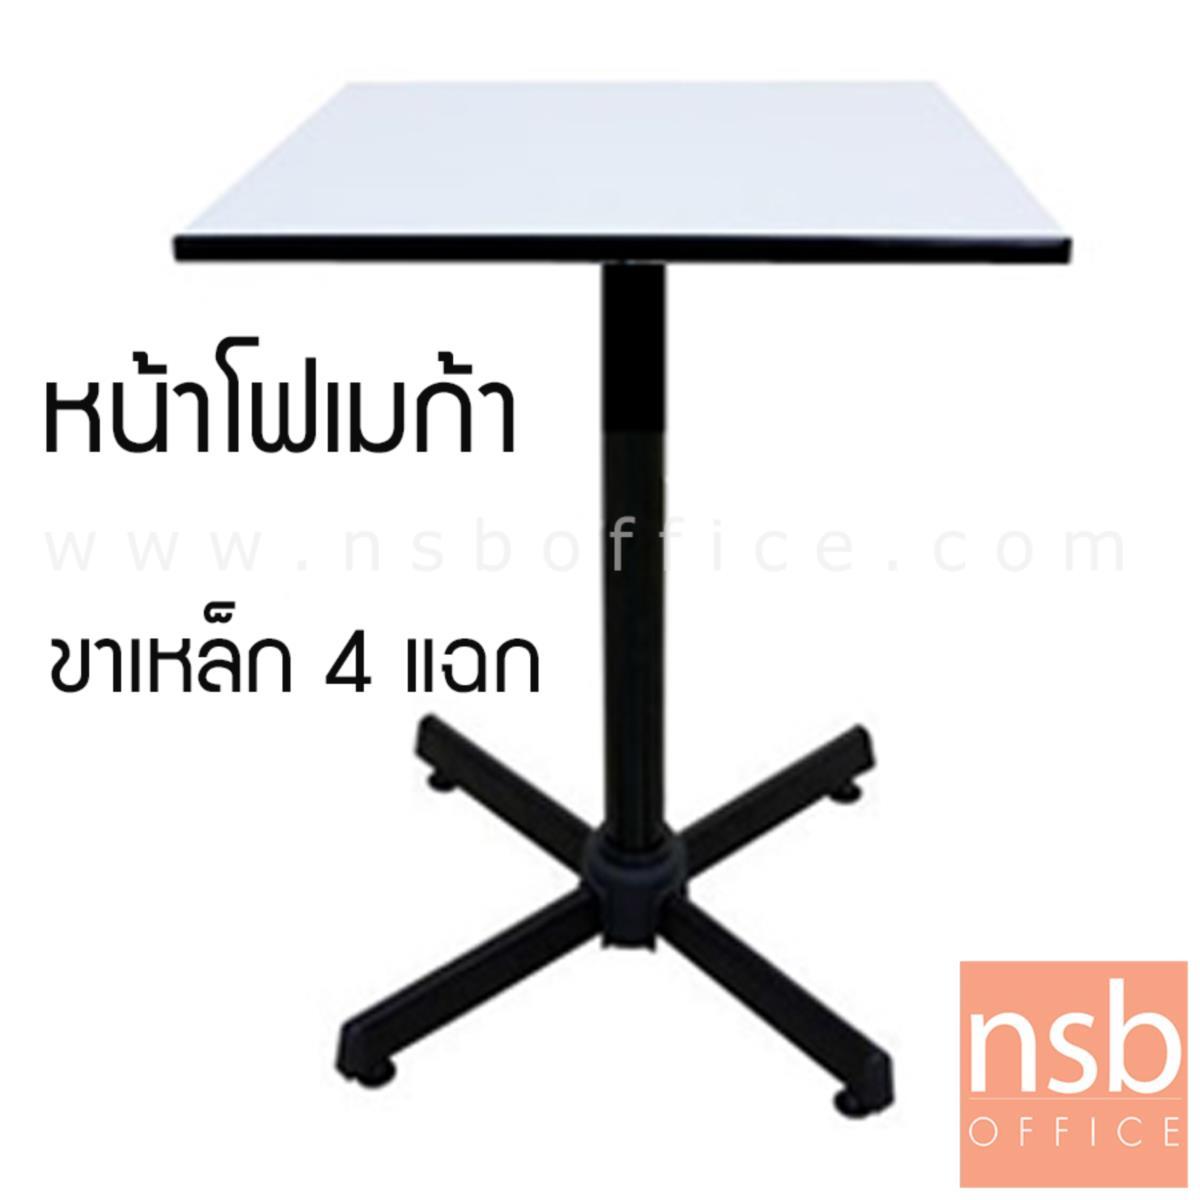 A07A053:โต๊ะหน้าโฟเมก้าขาว รุ่น Thalia 1 (ธาเลีย 1) ขนาด 60W ,75W ,60Di ,75Di cm.   โครงขาเหล็ก 4 แฉกสีดำ